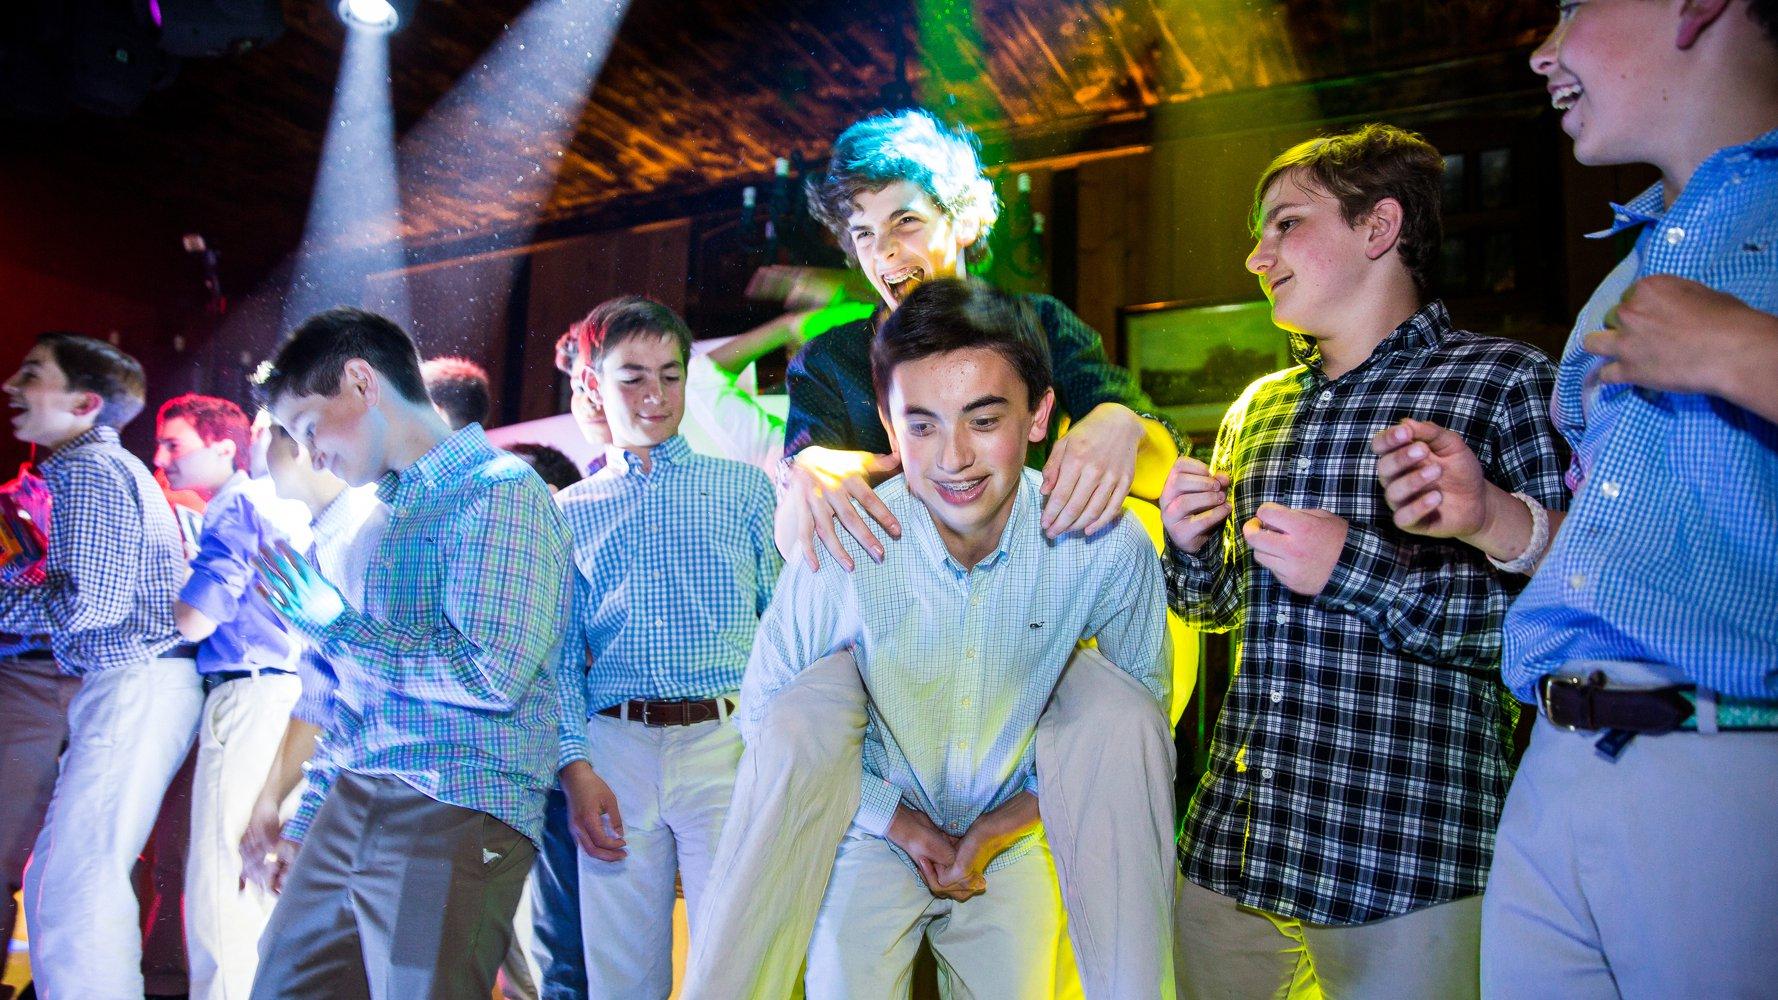 Bar Mitzvah kids dancing